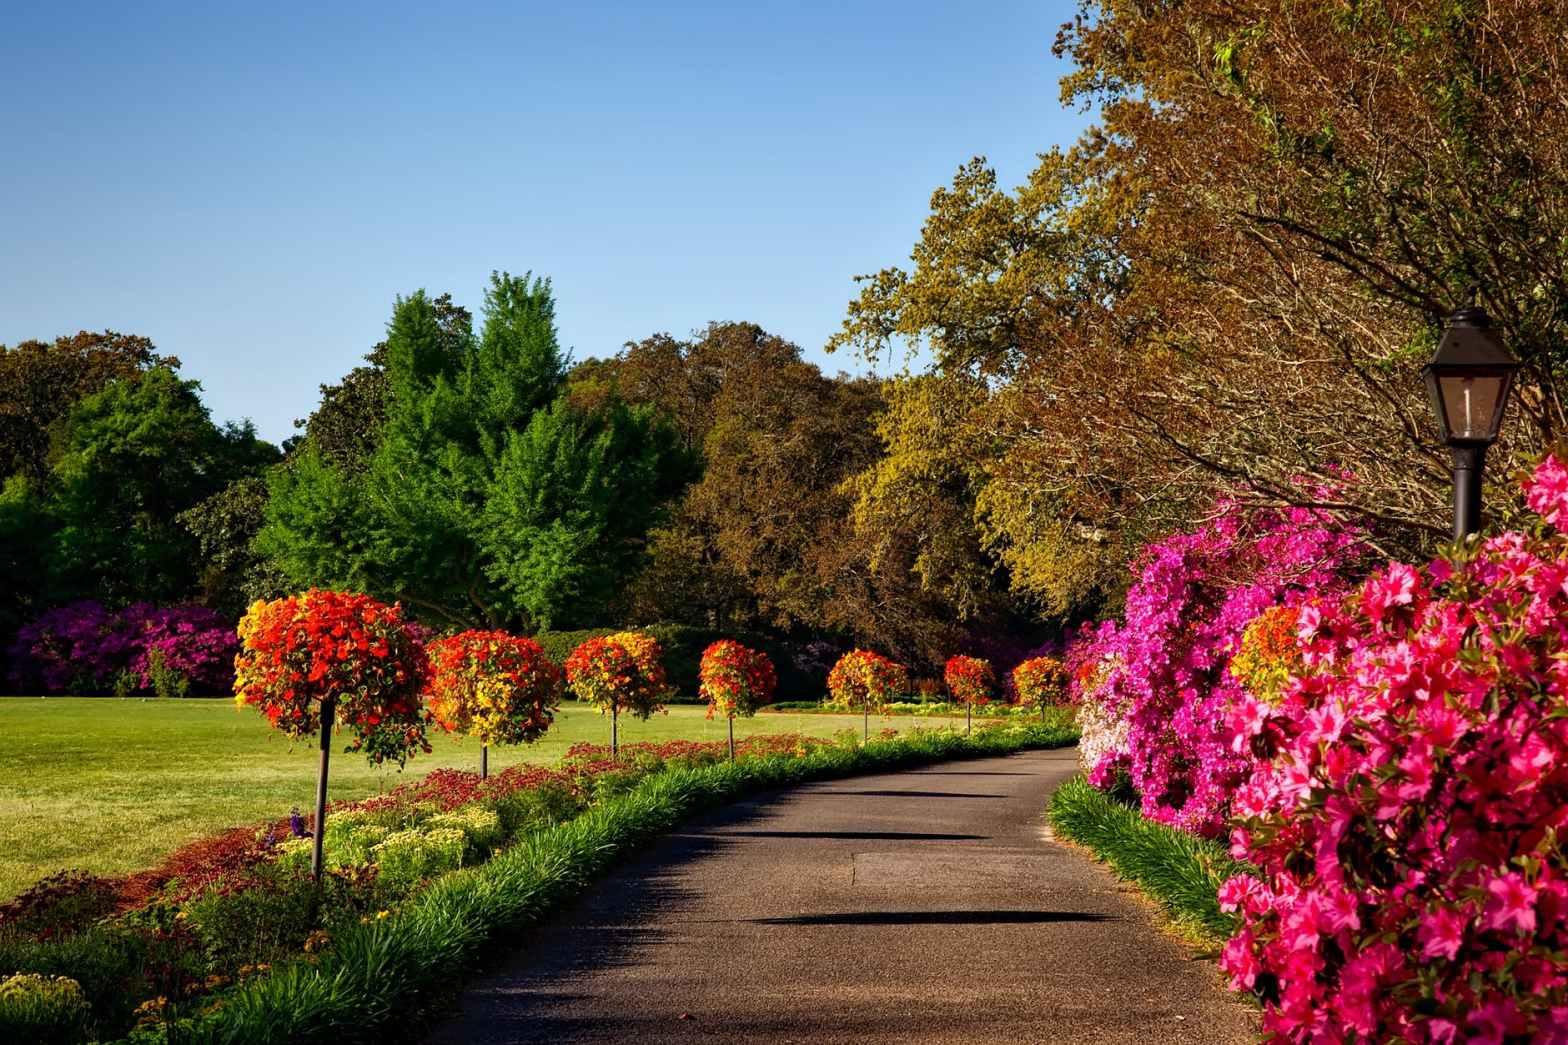 pollinator pathway